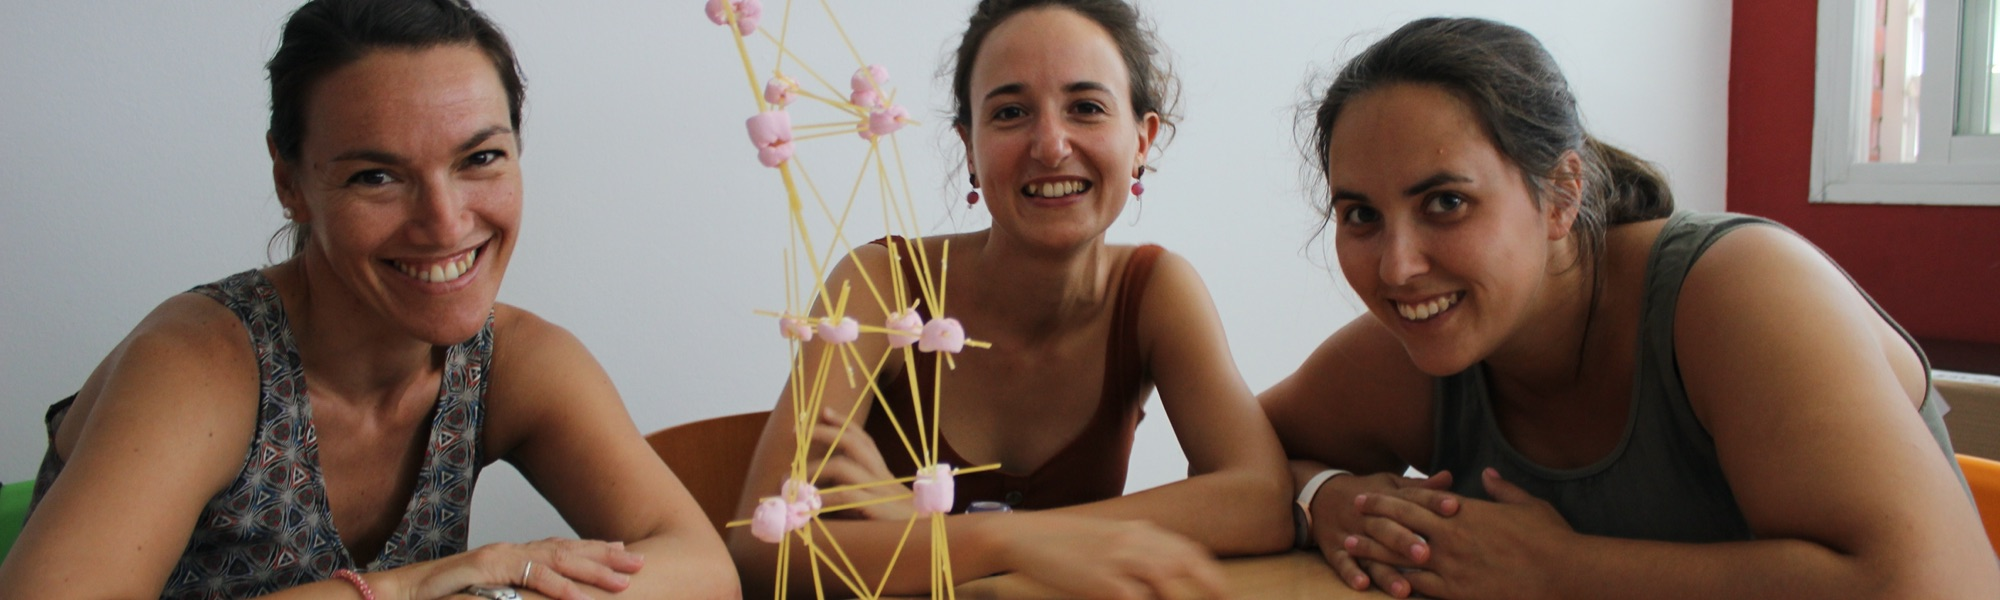 Mestres després de fer una marshmallow challenge